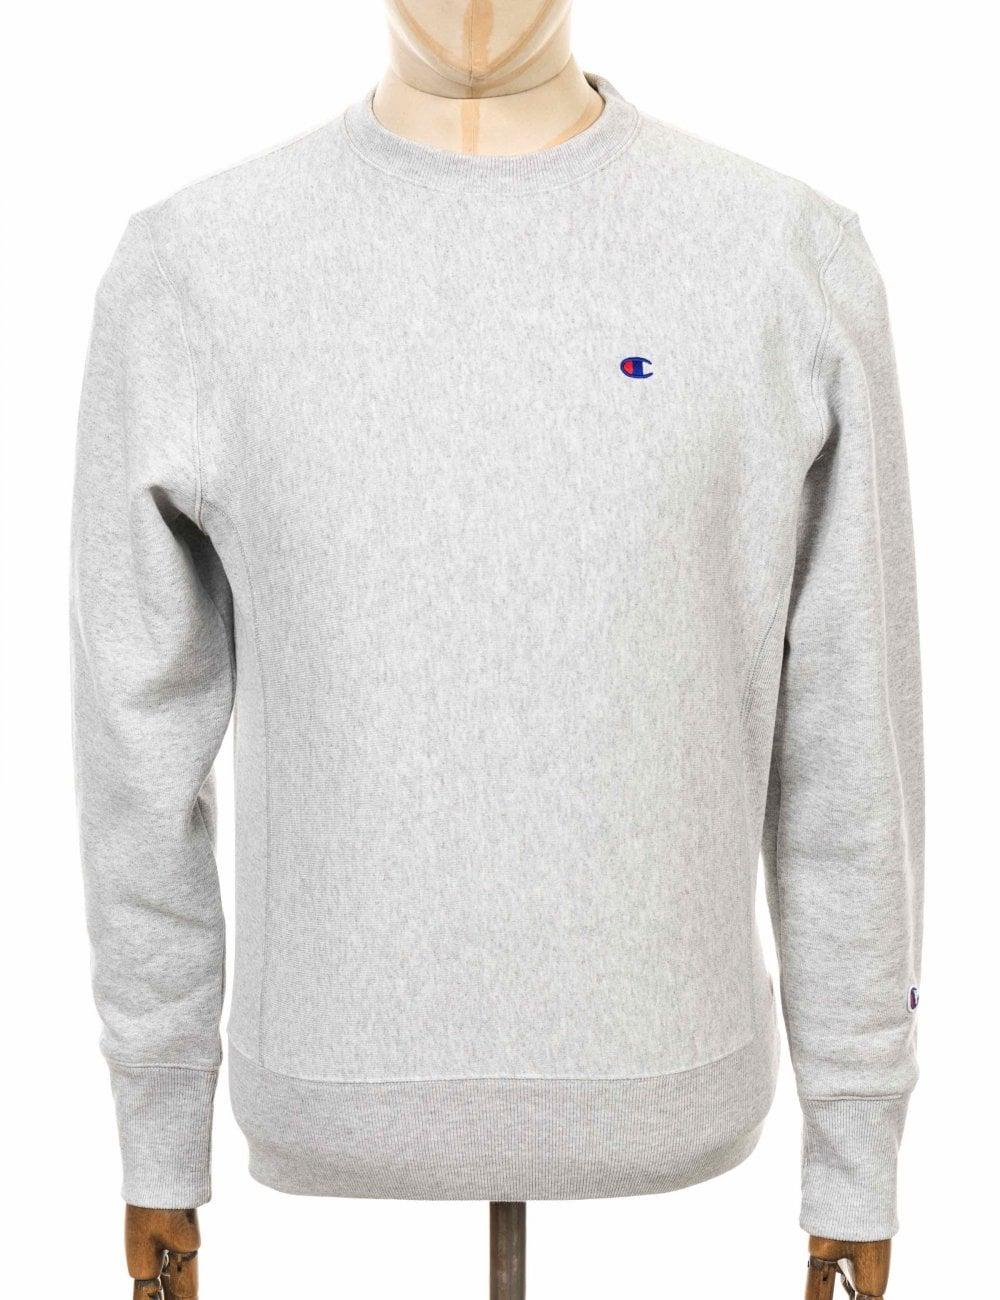 ea346b4d Champion Reverse Weave Crewneck Sweatshirt - LOXGM Light Grey - Clothing  from Fat Buddha Store UK